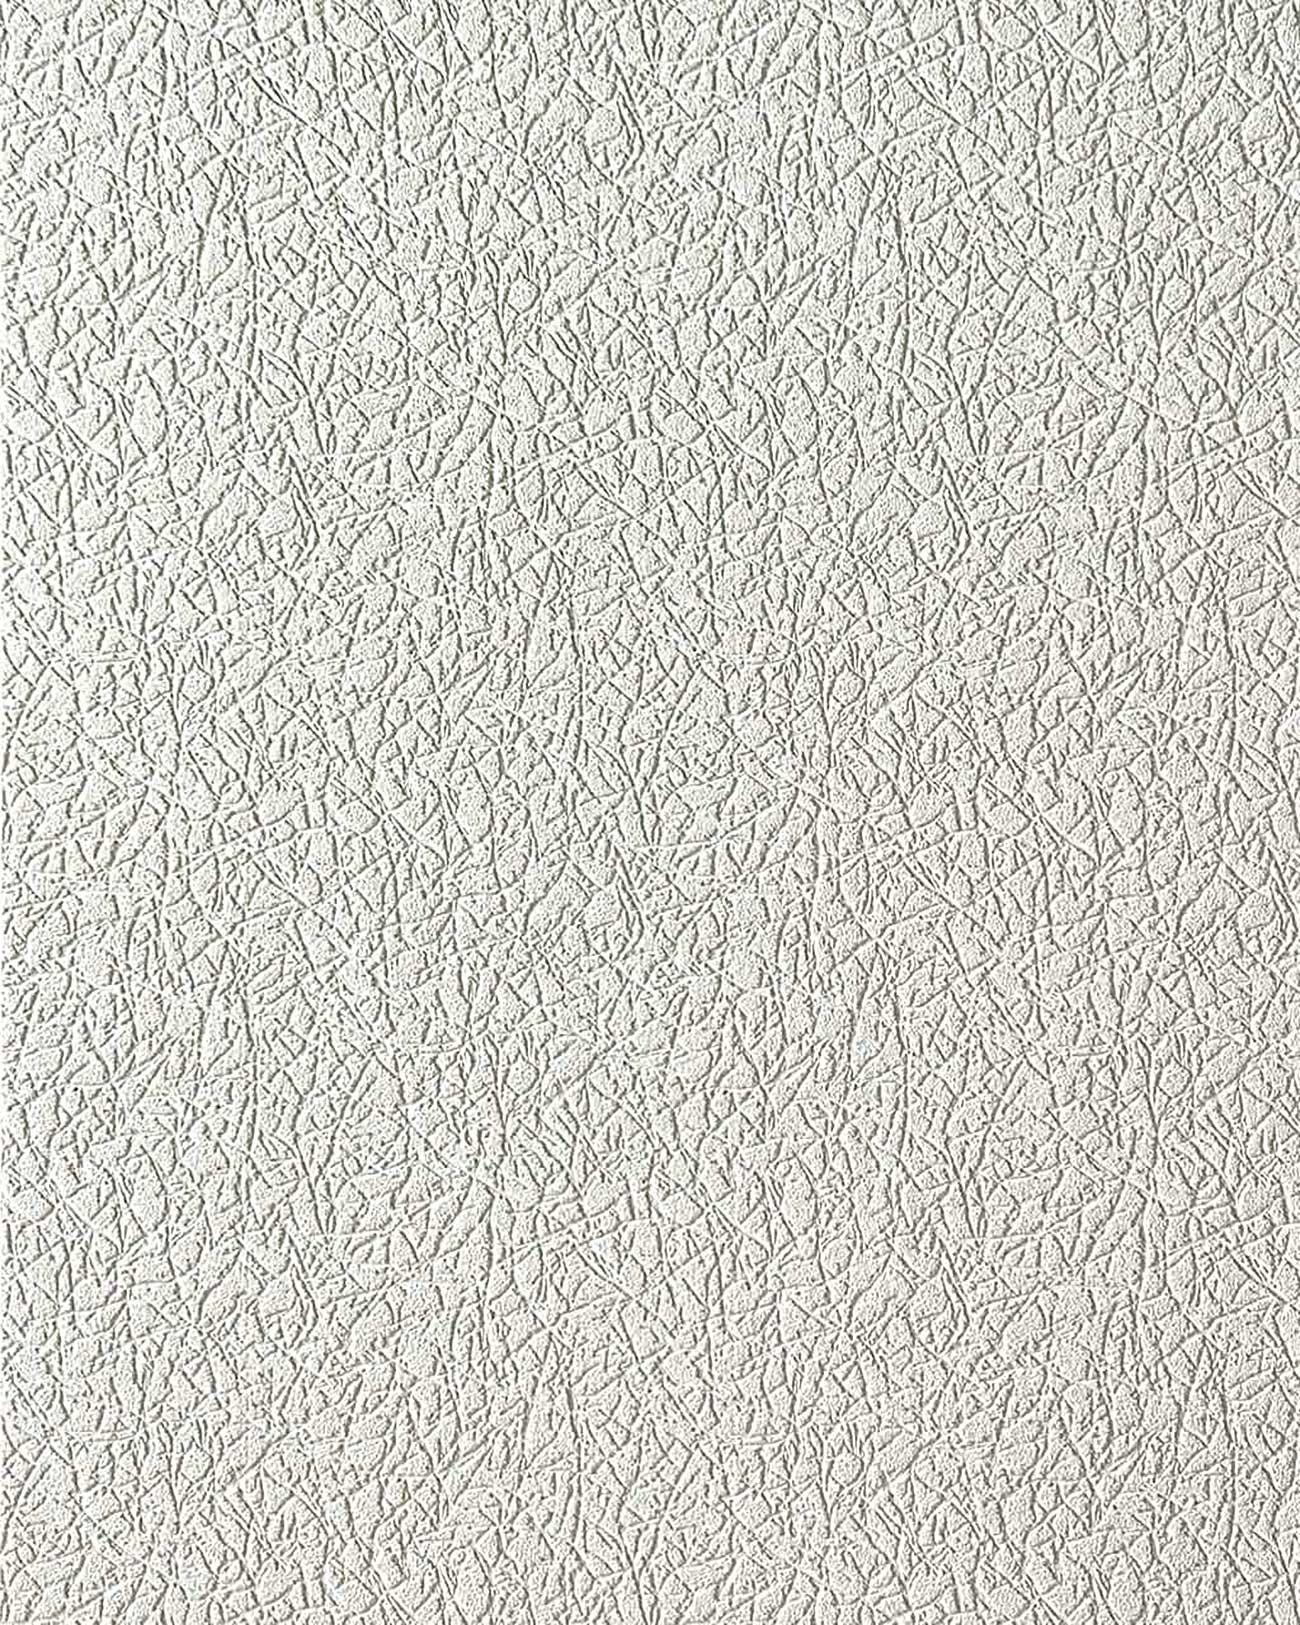 uni tapete edem 206 40 dekorative vinyl schaum tapete wei. Black Bedroom Furniture Sets. Home Design Ideas